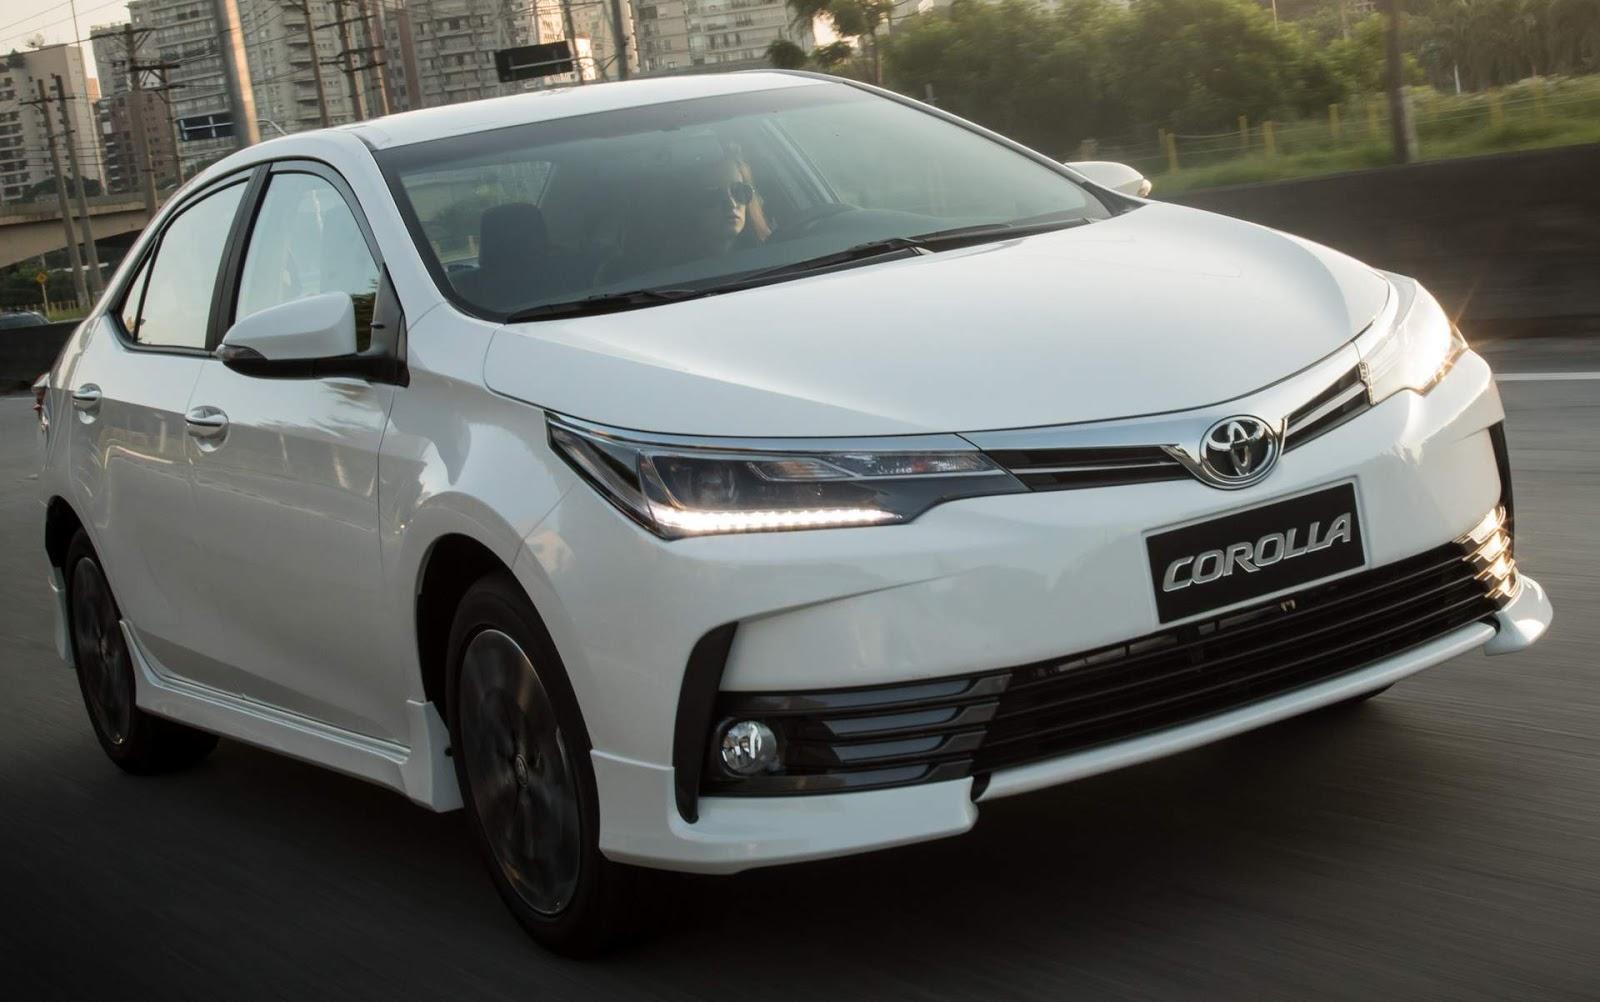 All New Corolla Altis 2019 Grand Avanza Basic Xrs 2018 Design Esportivo Para Atrair Os Jovens